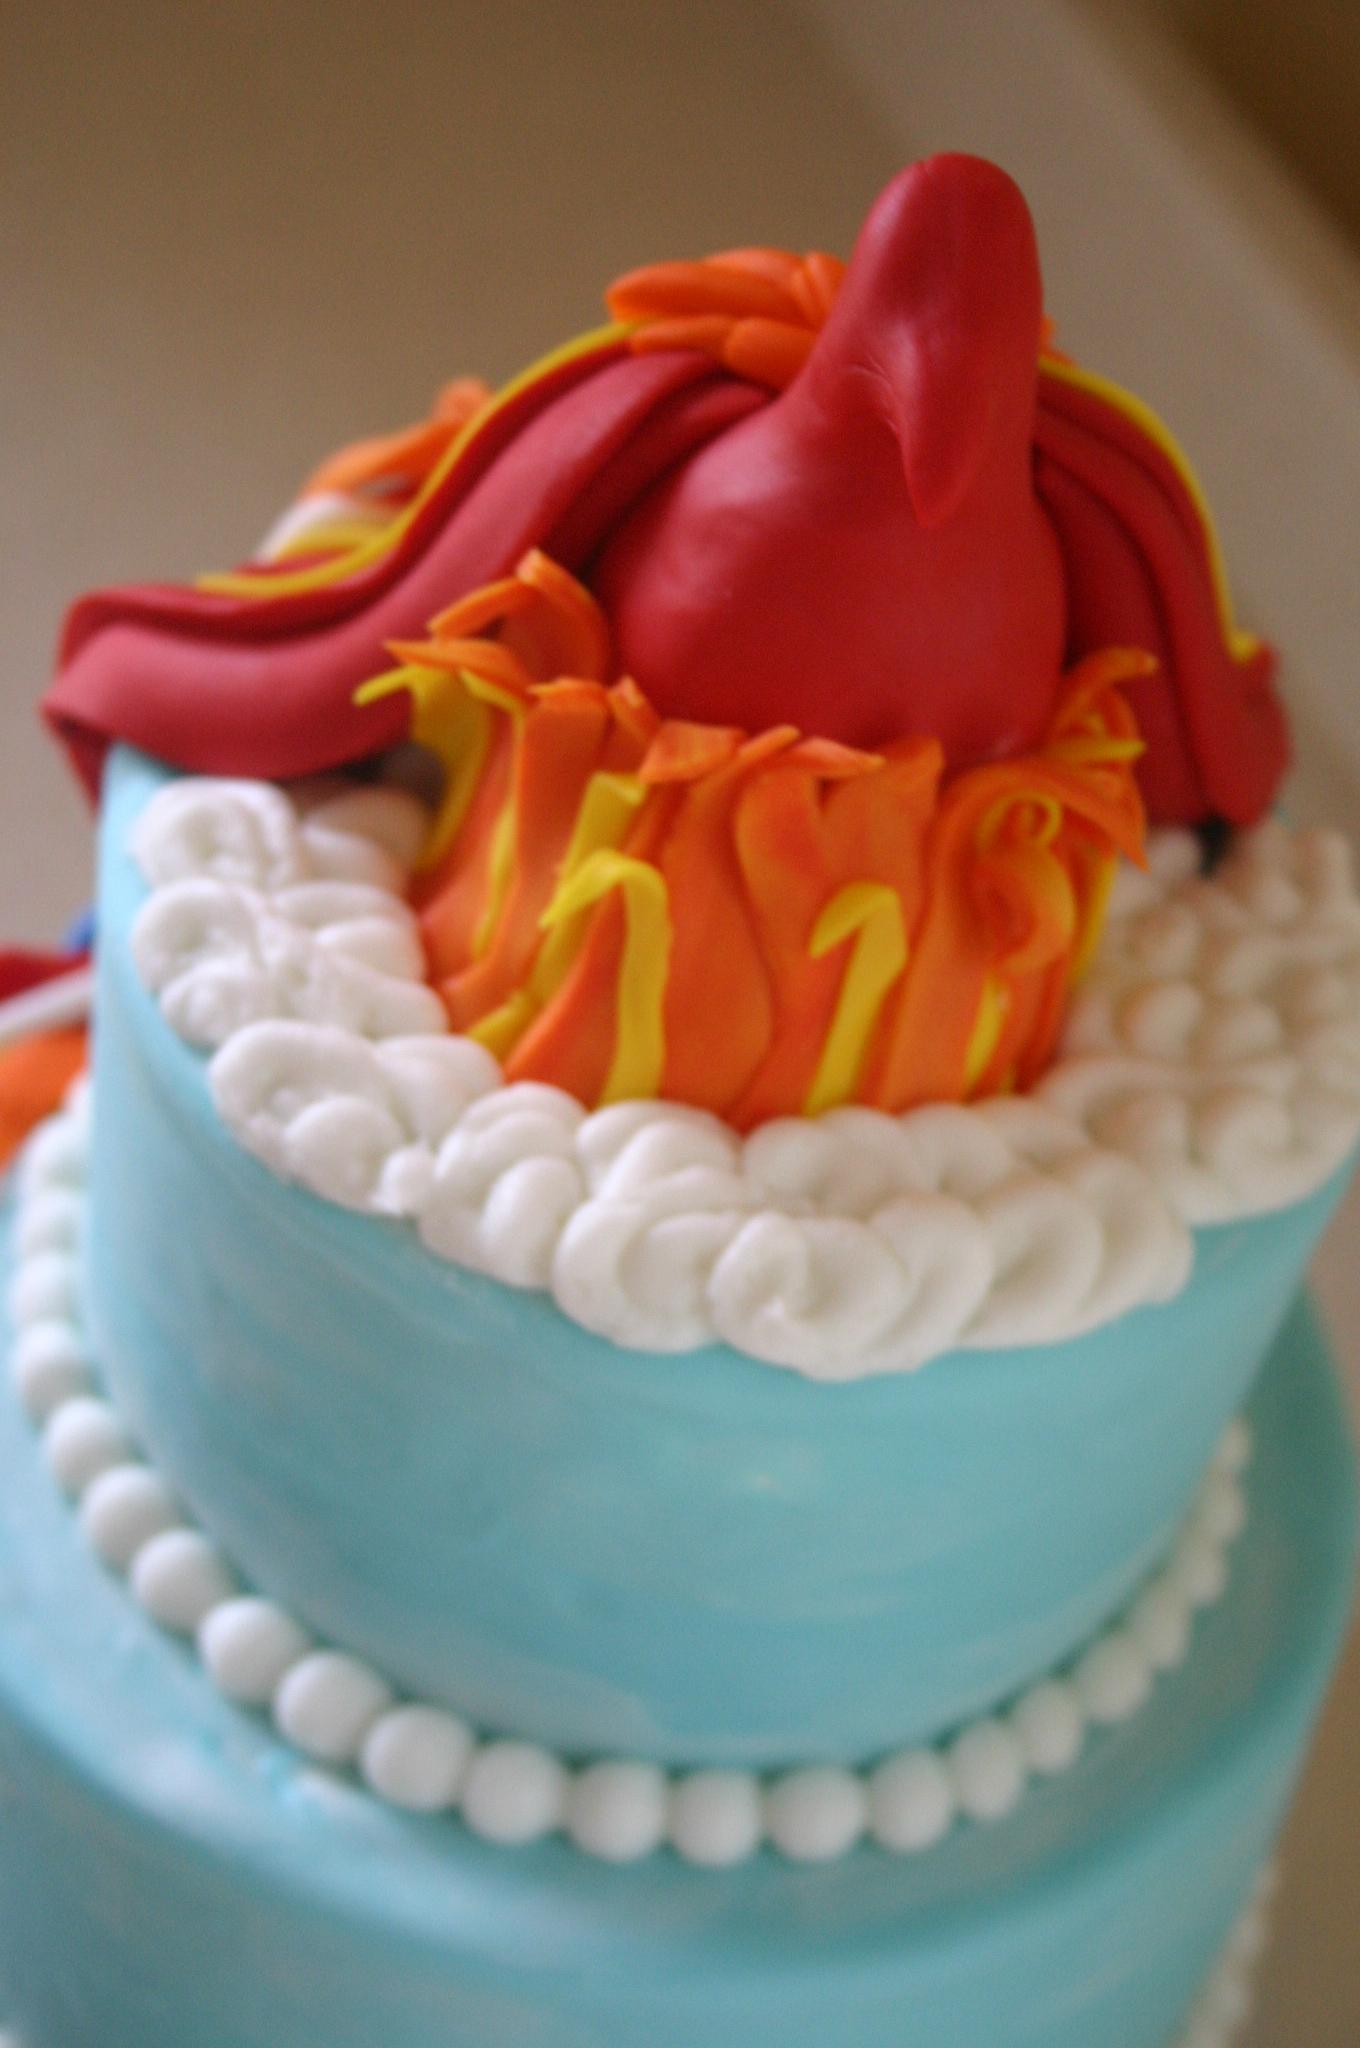 Superb Flaming Phoenix Birthday Cake Lolos Cakes Sweets Birthday Cards Printable Trancafe Filternl